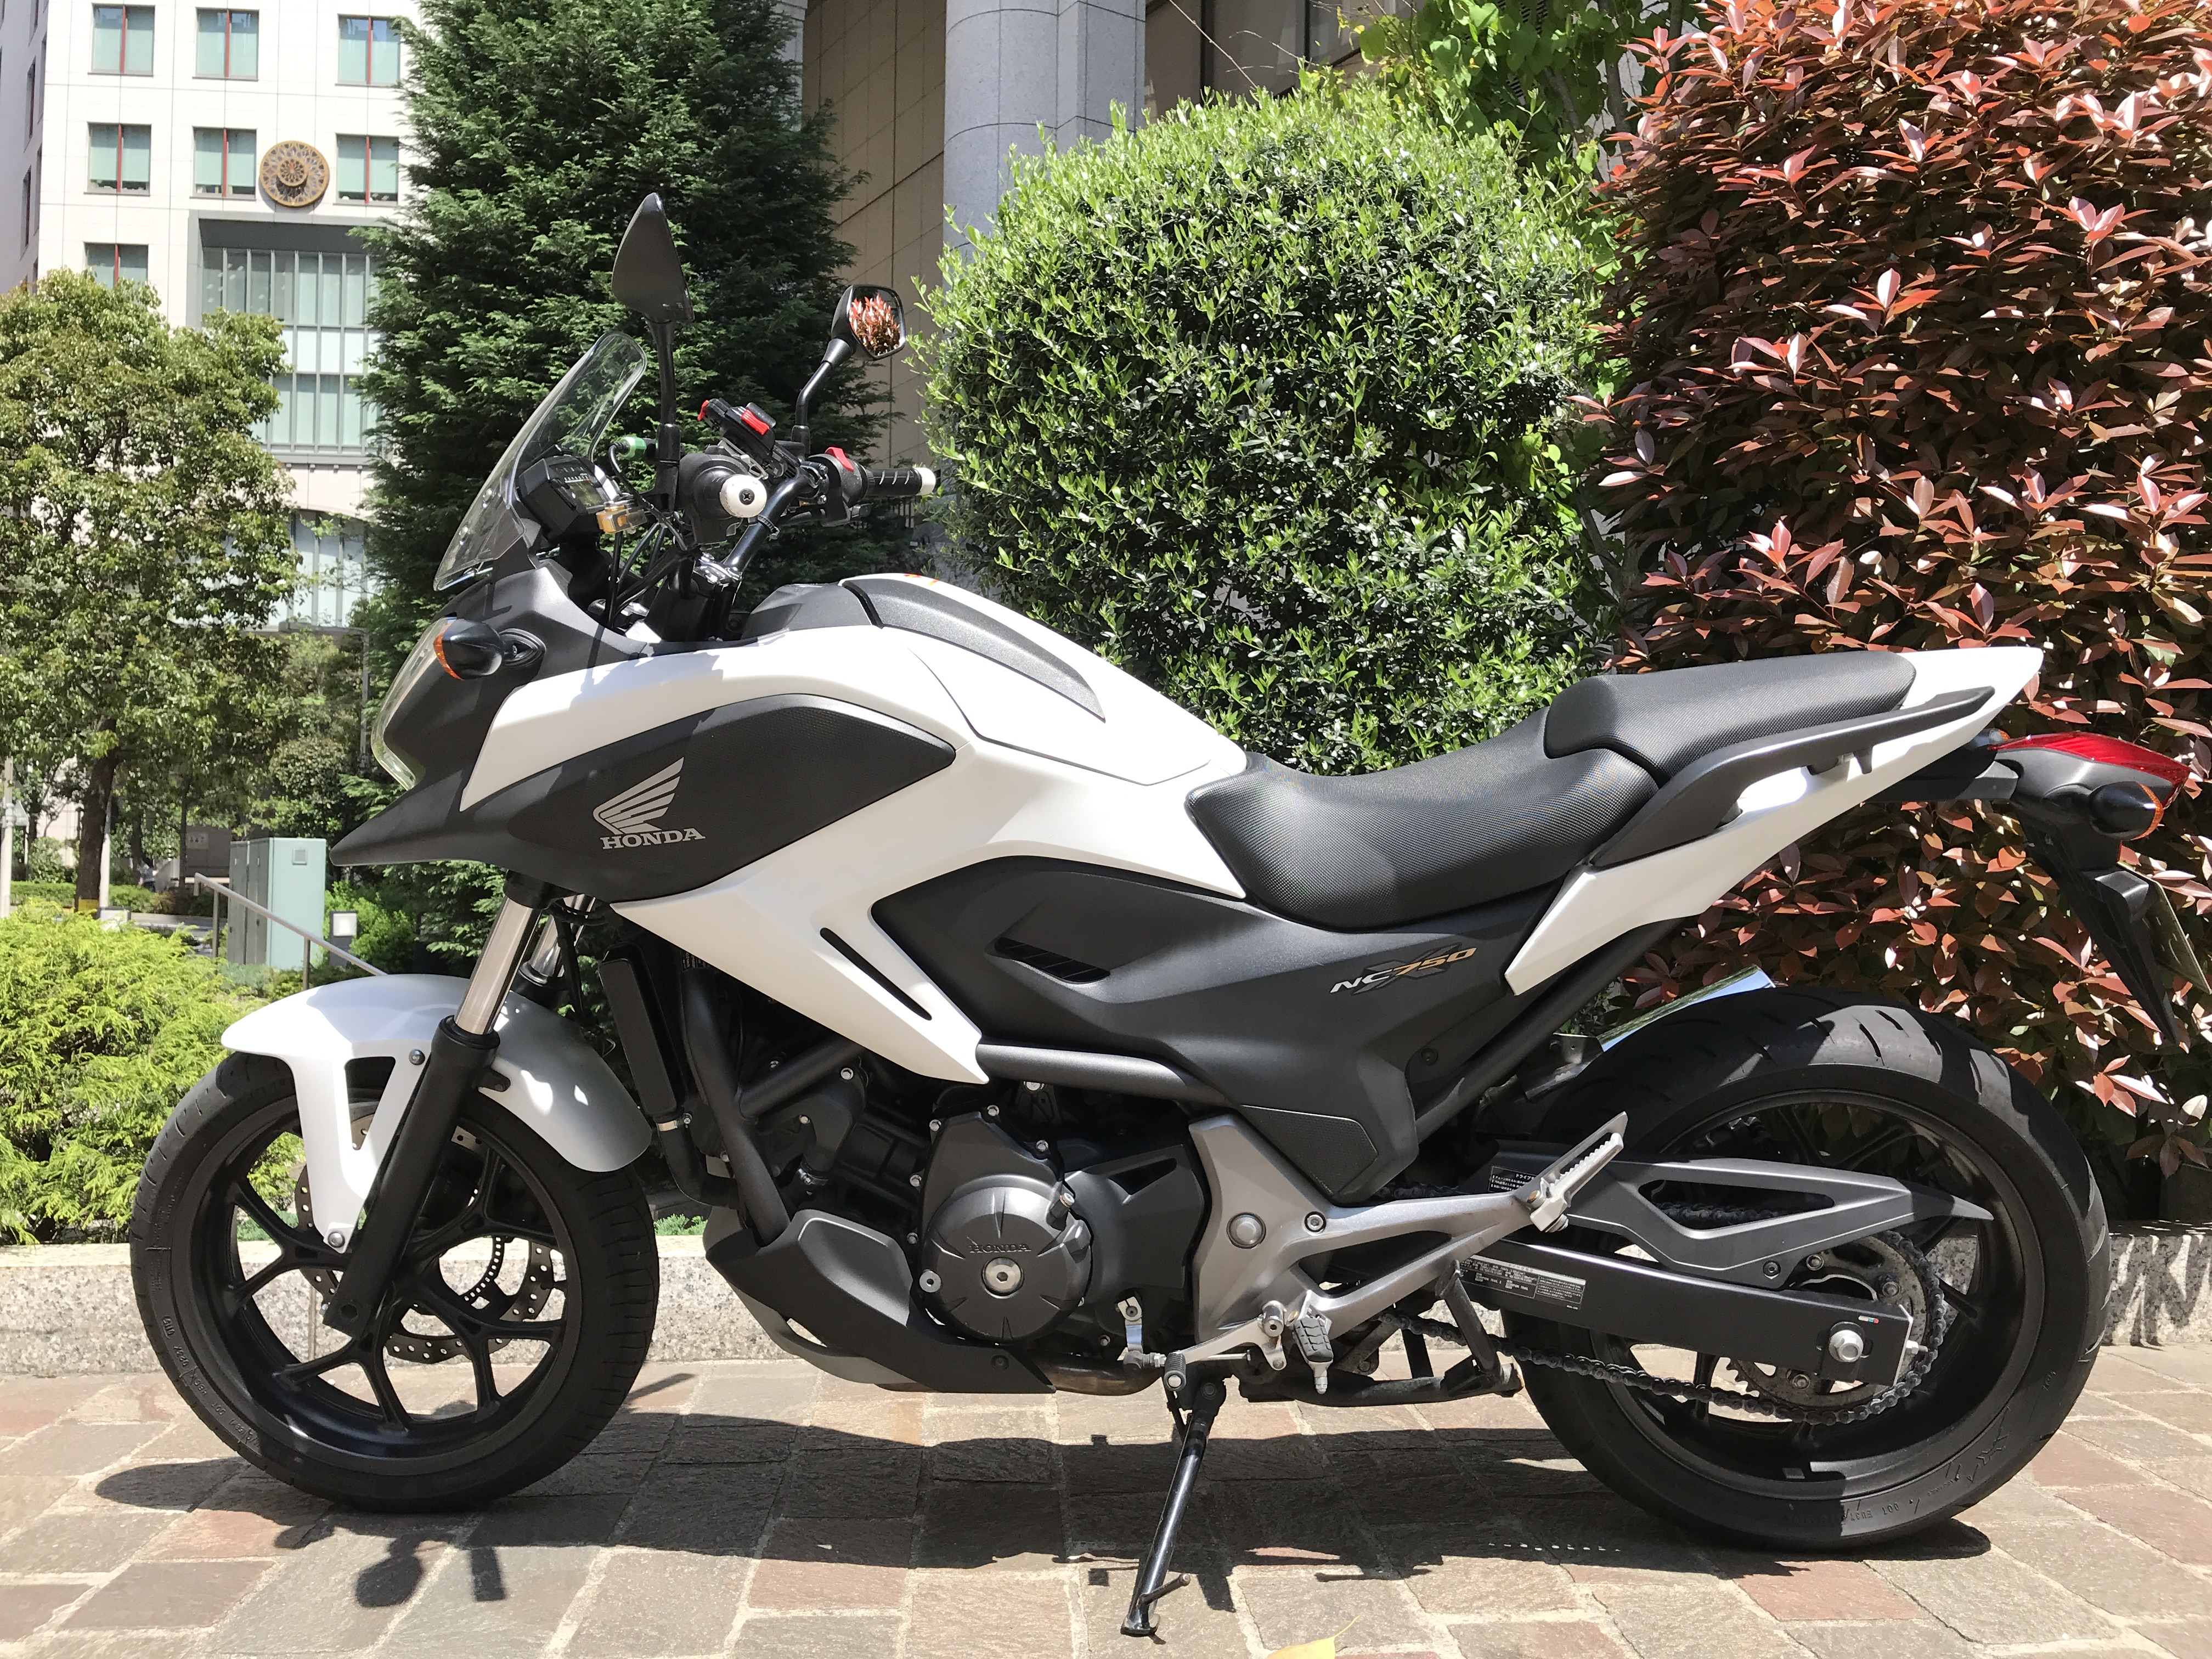 NC750X (HN-00) - 【公式】レンタルバイクのベストBike® 阿佐ヶ谷駅前